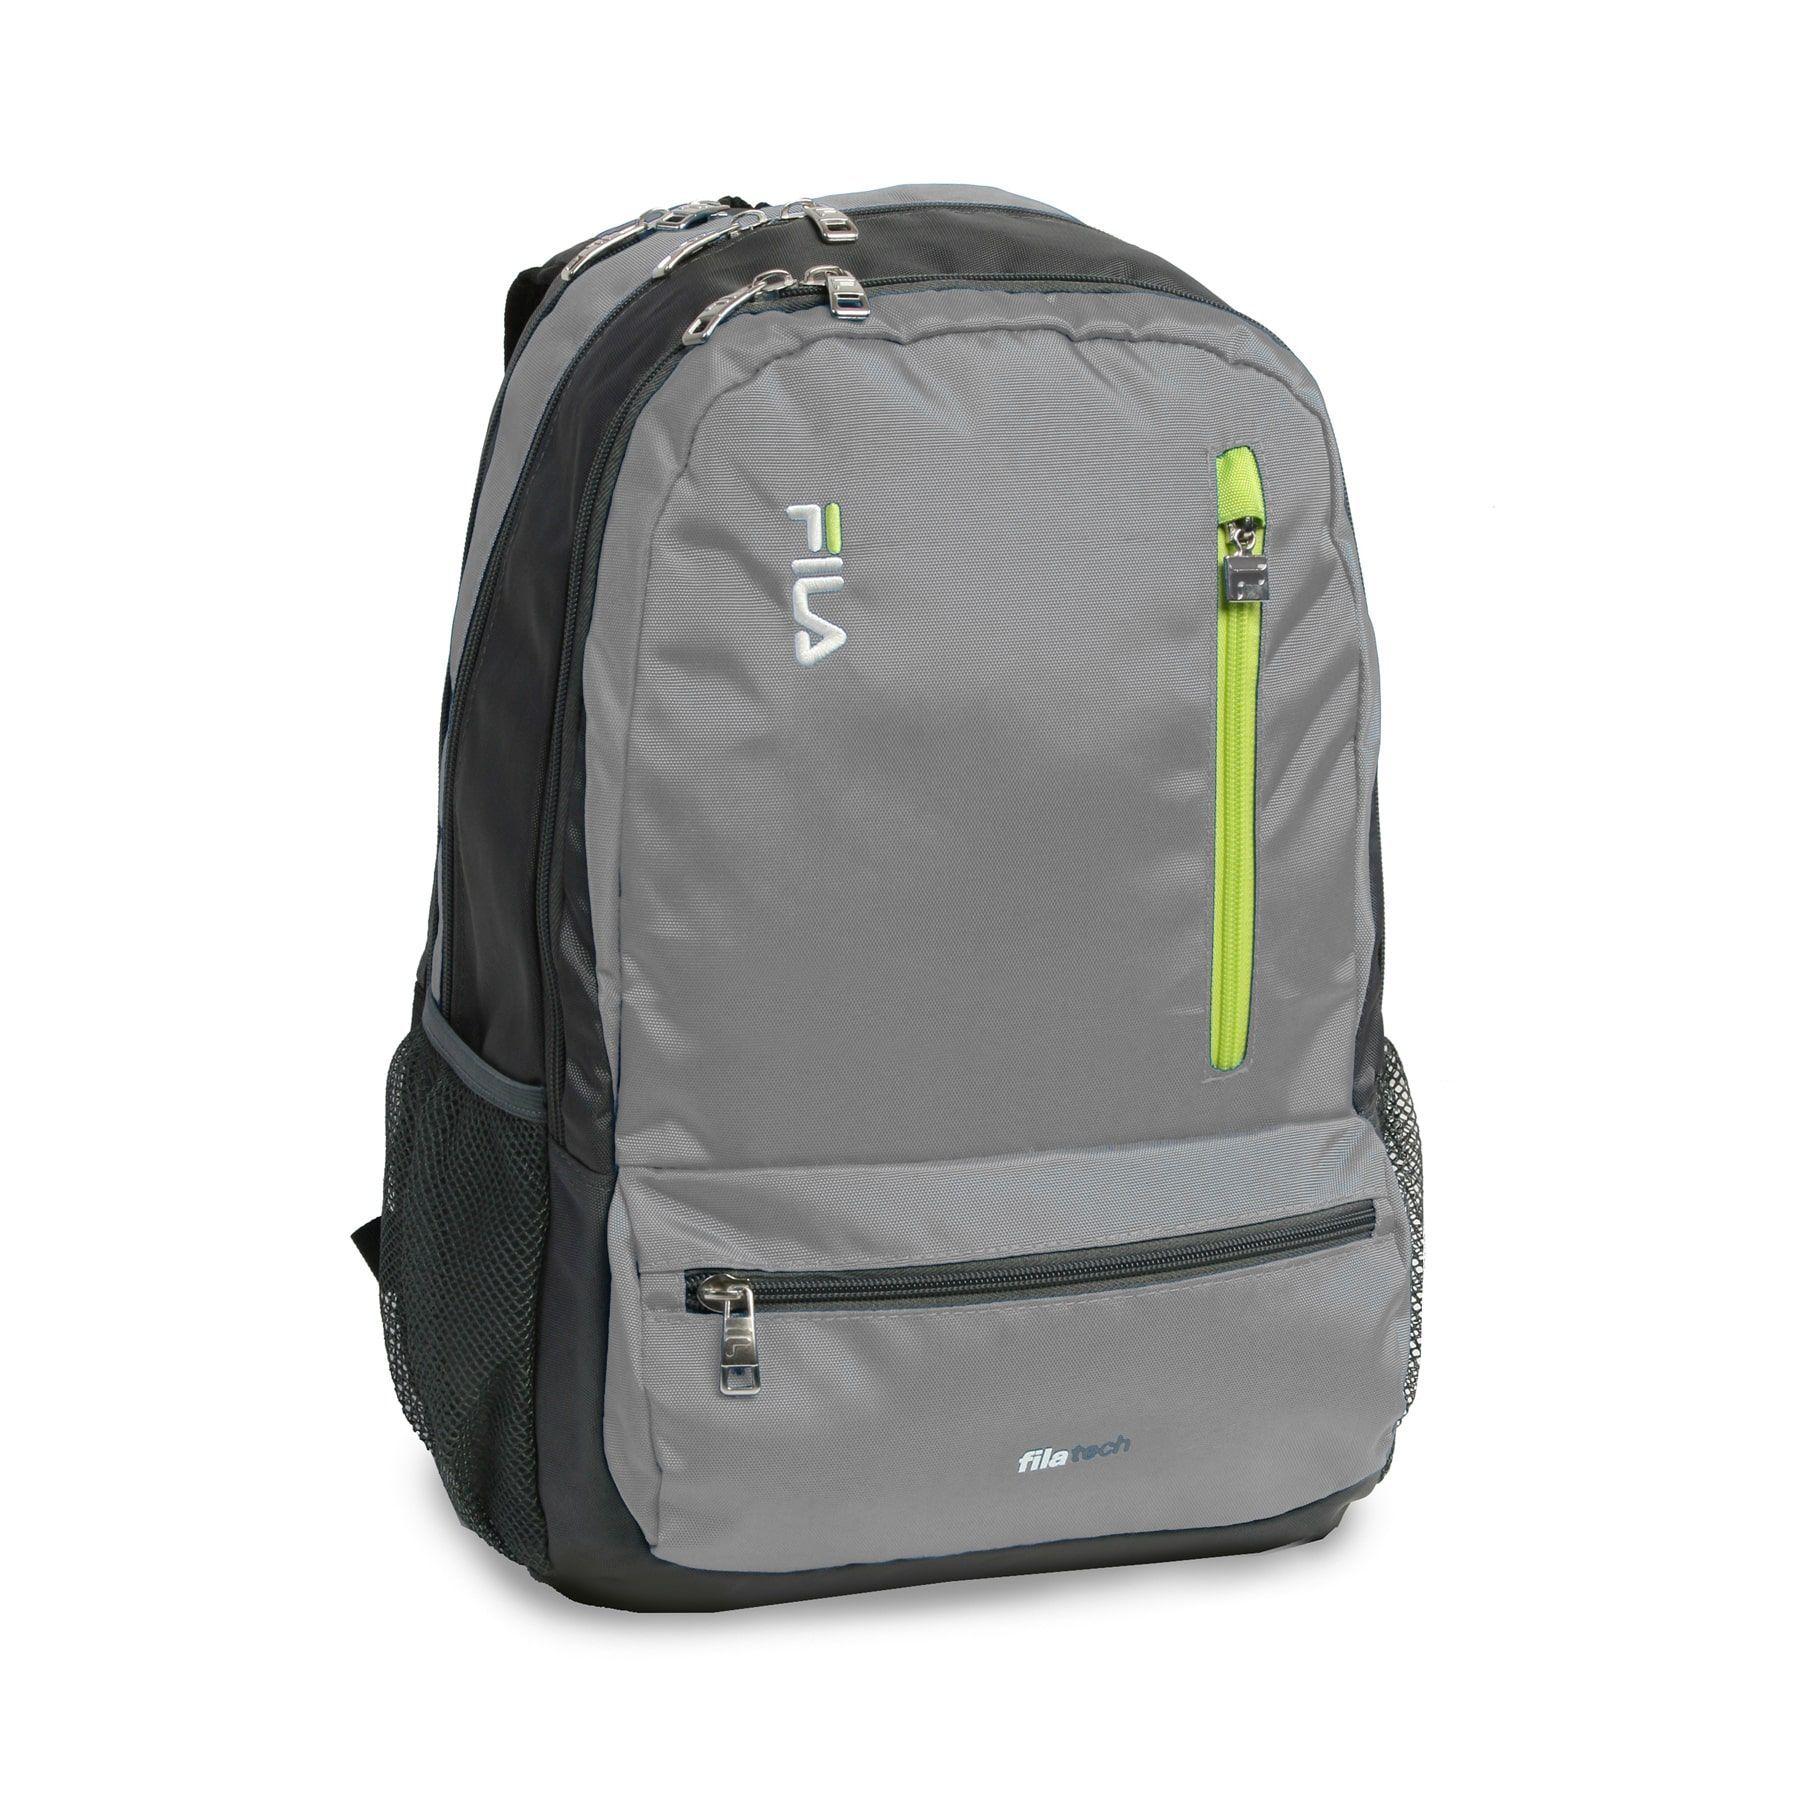 Fila Nexus Tablet and 15-inch Laptop School Backpack - 5 Pockets ... 14ab38820ec15